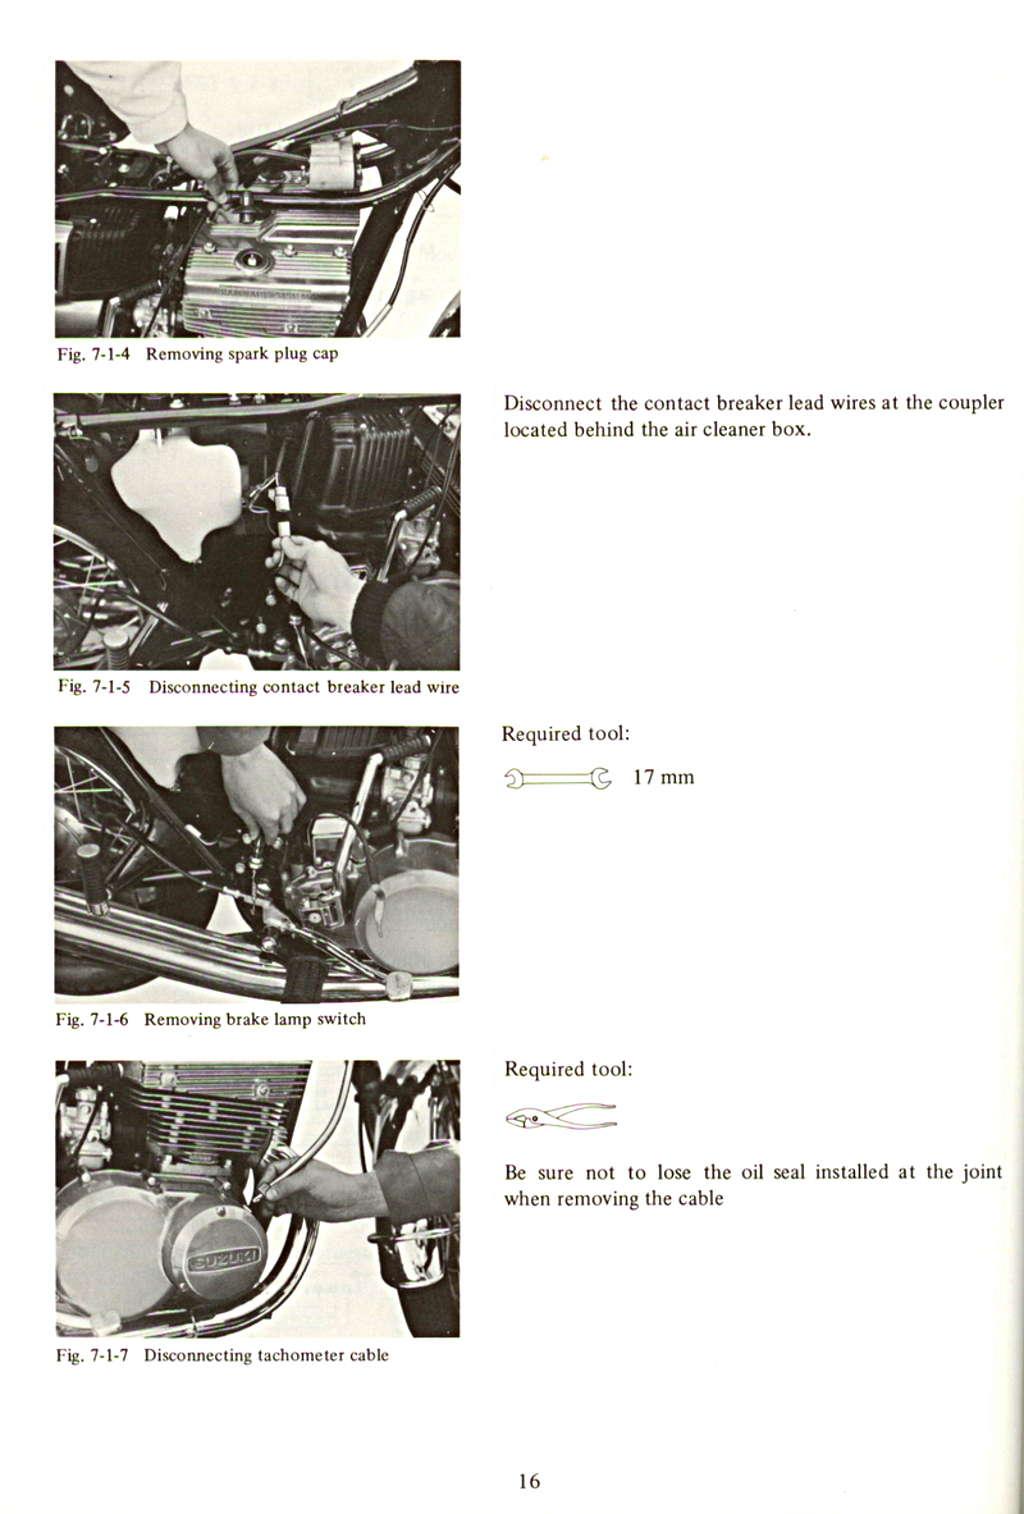 Gt550 Service Manual Suzuki Wiring Diagram Engine Removal